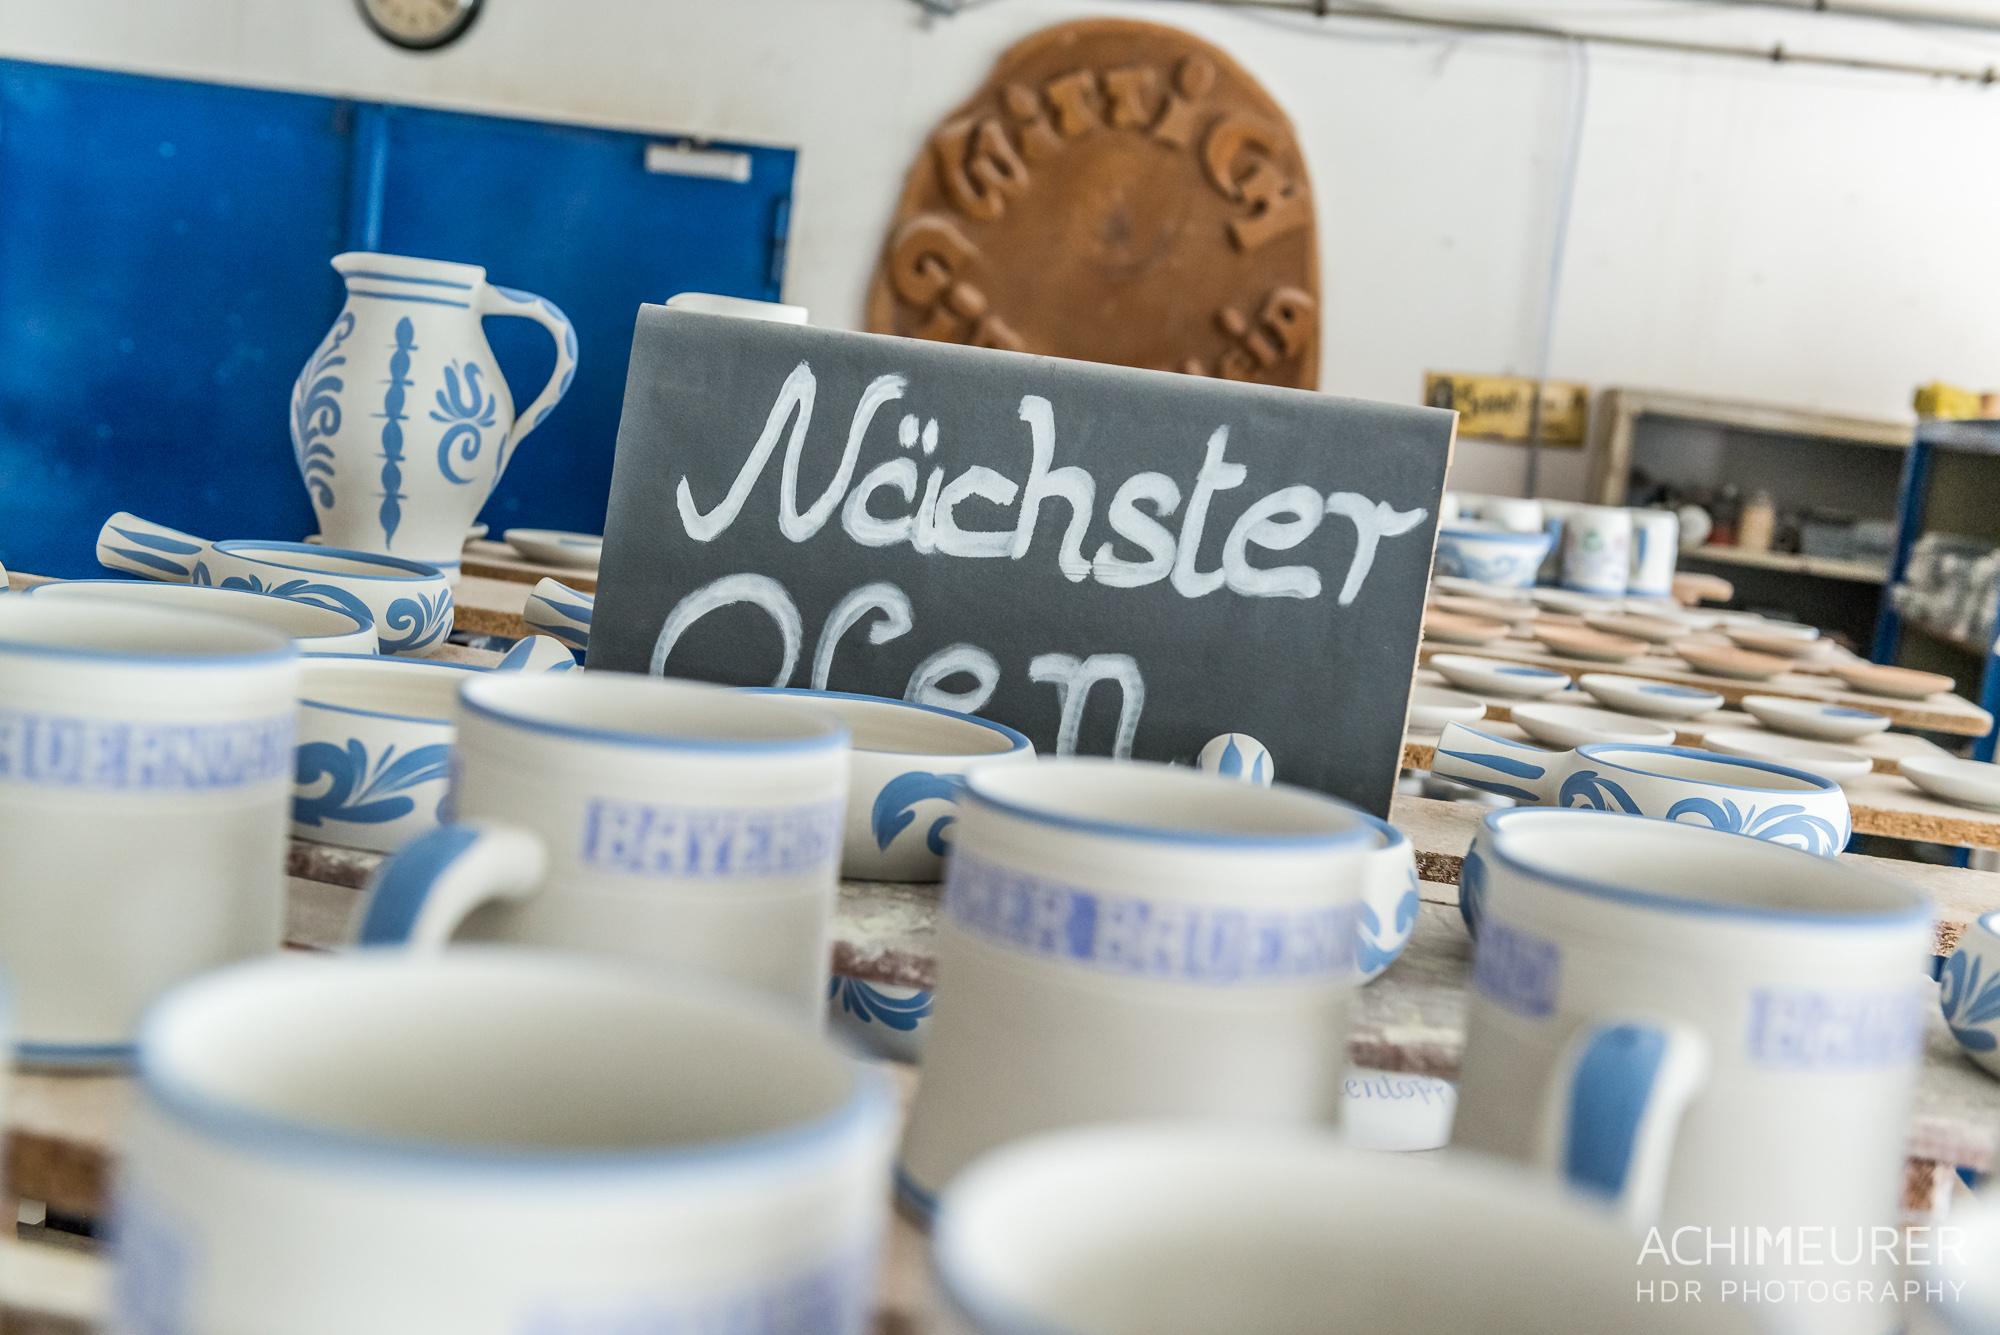 Kannenbaeckerland-keramik_5162